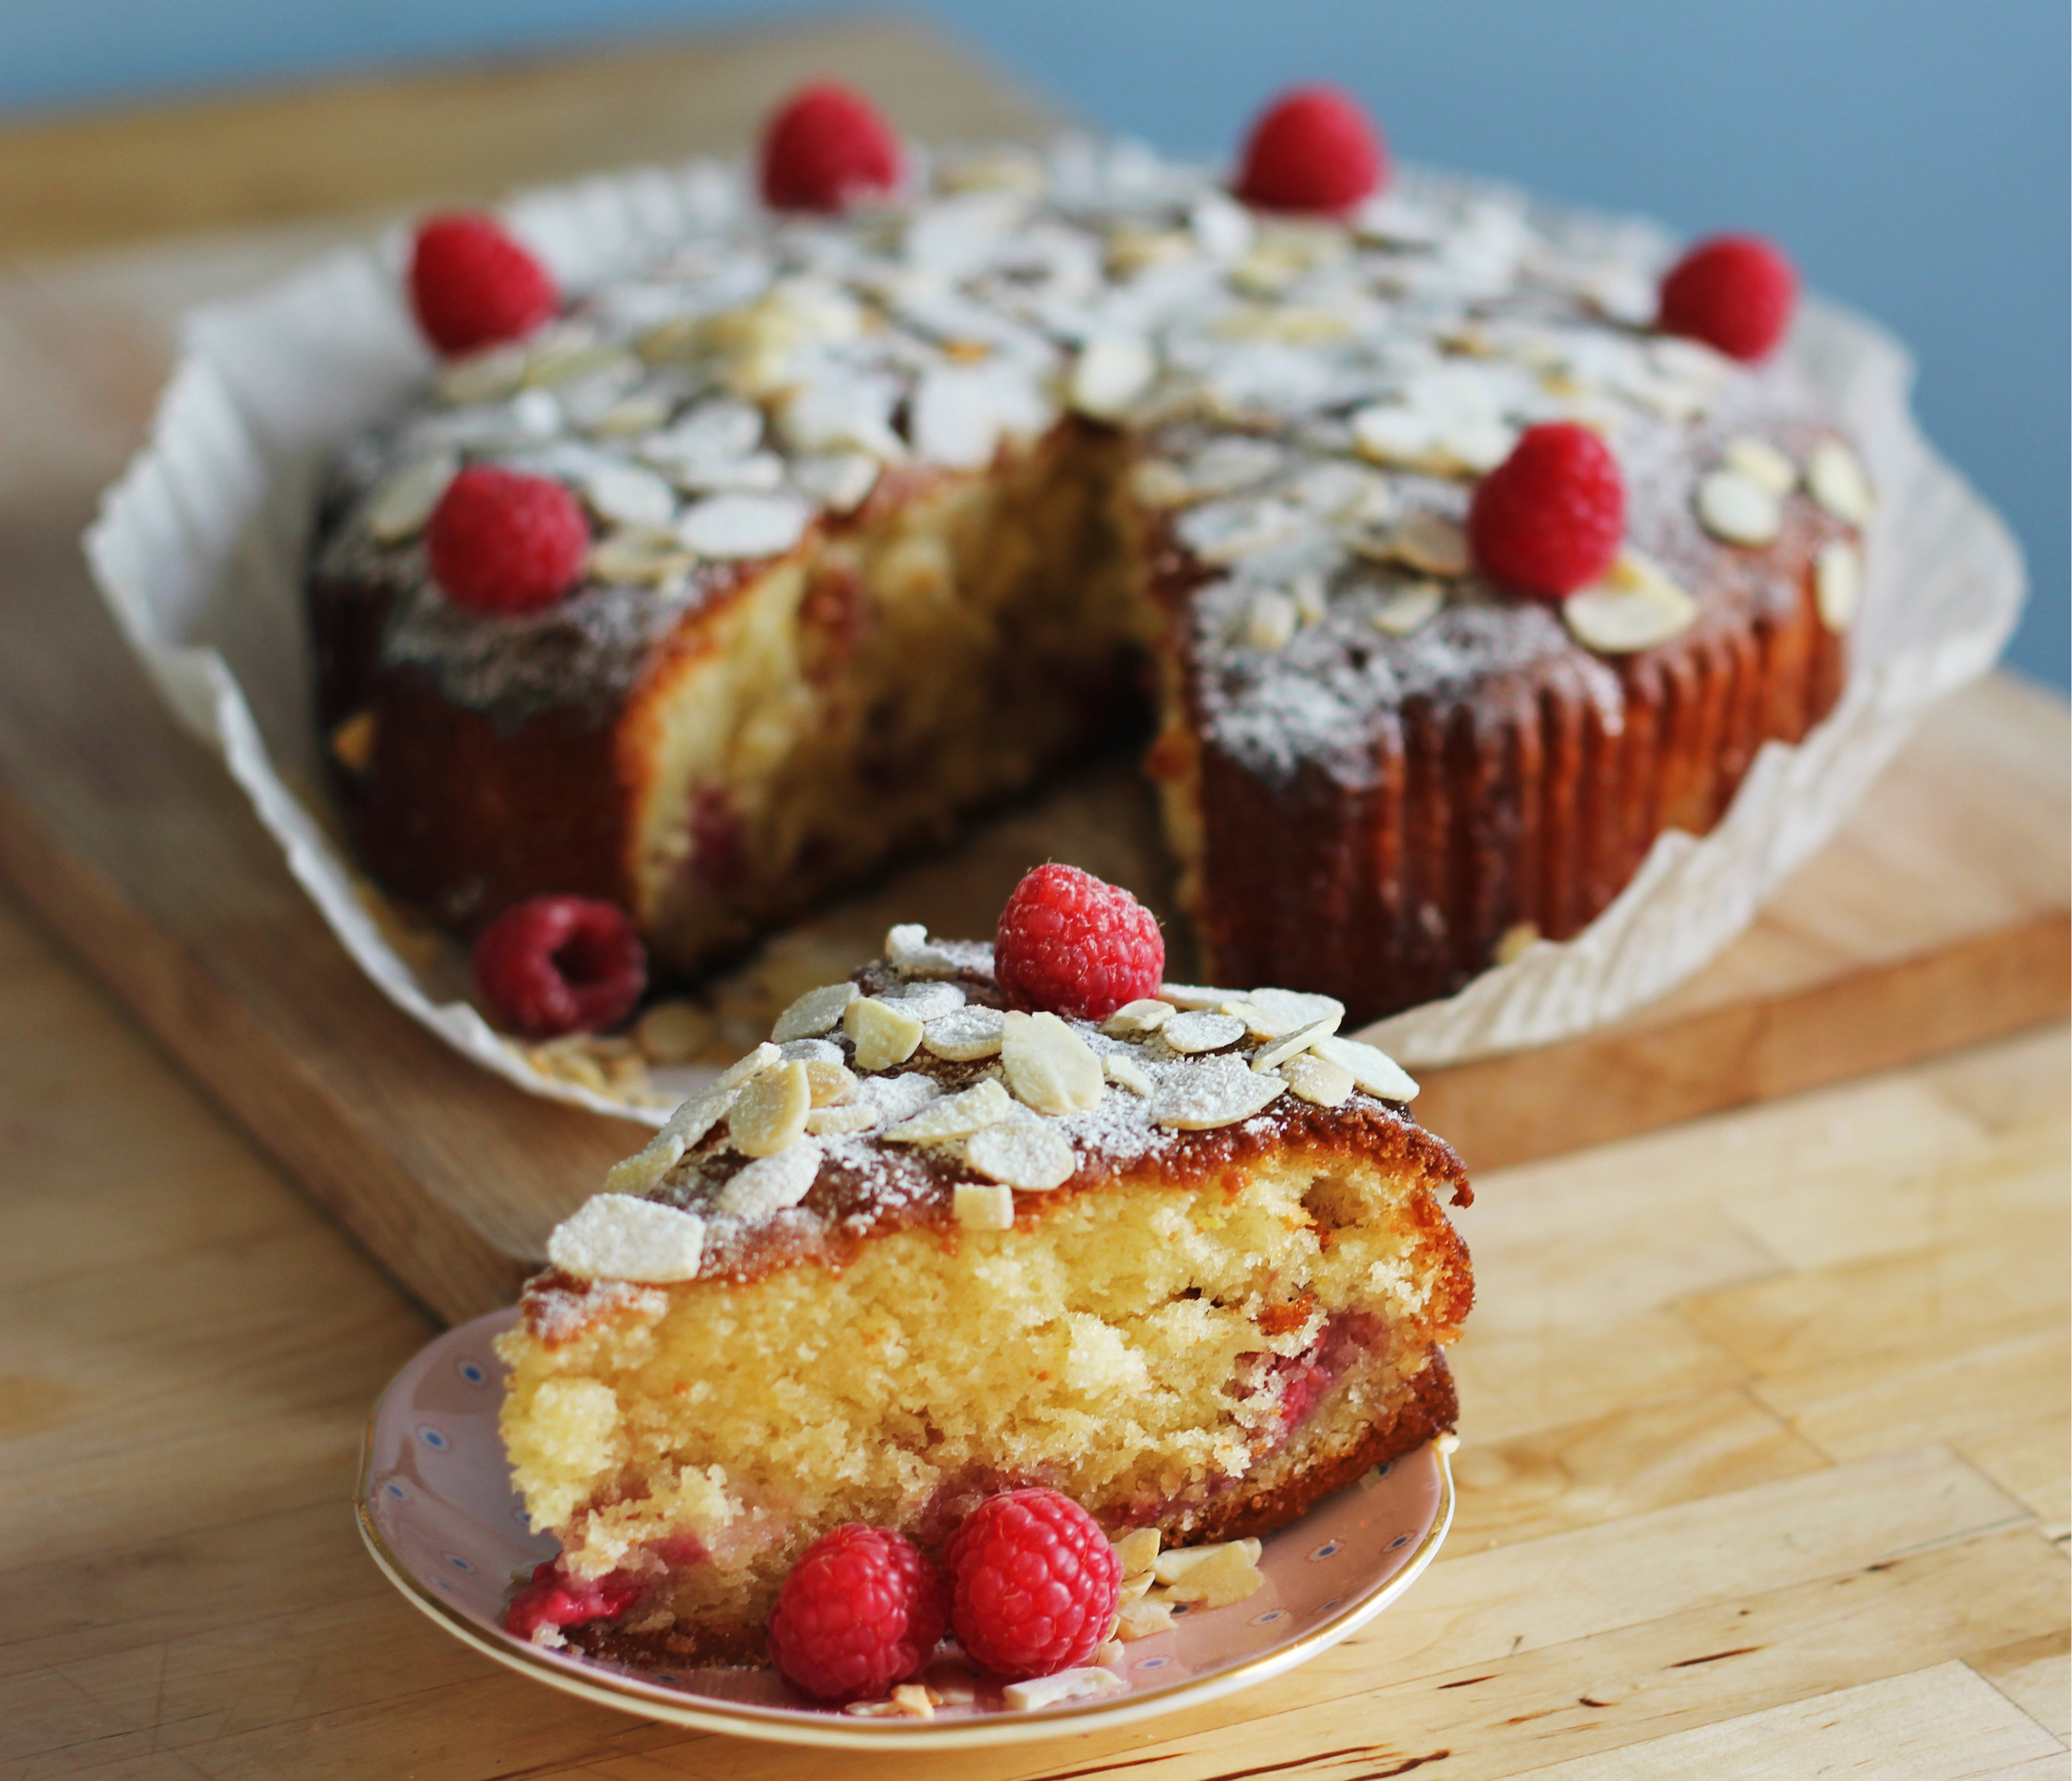 St Germain Cake